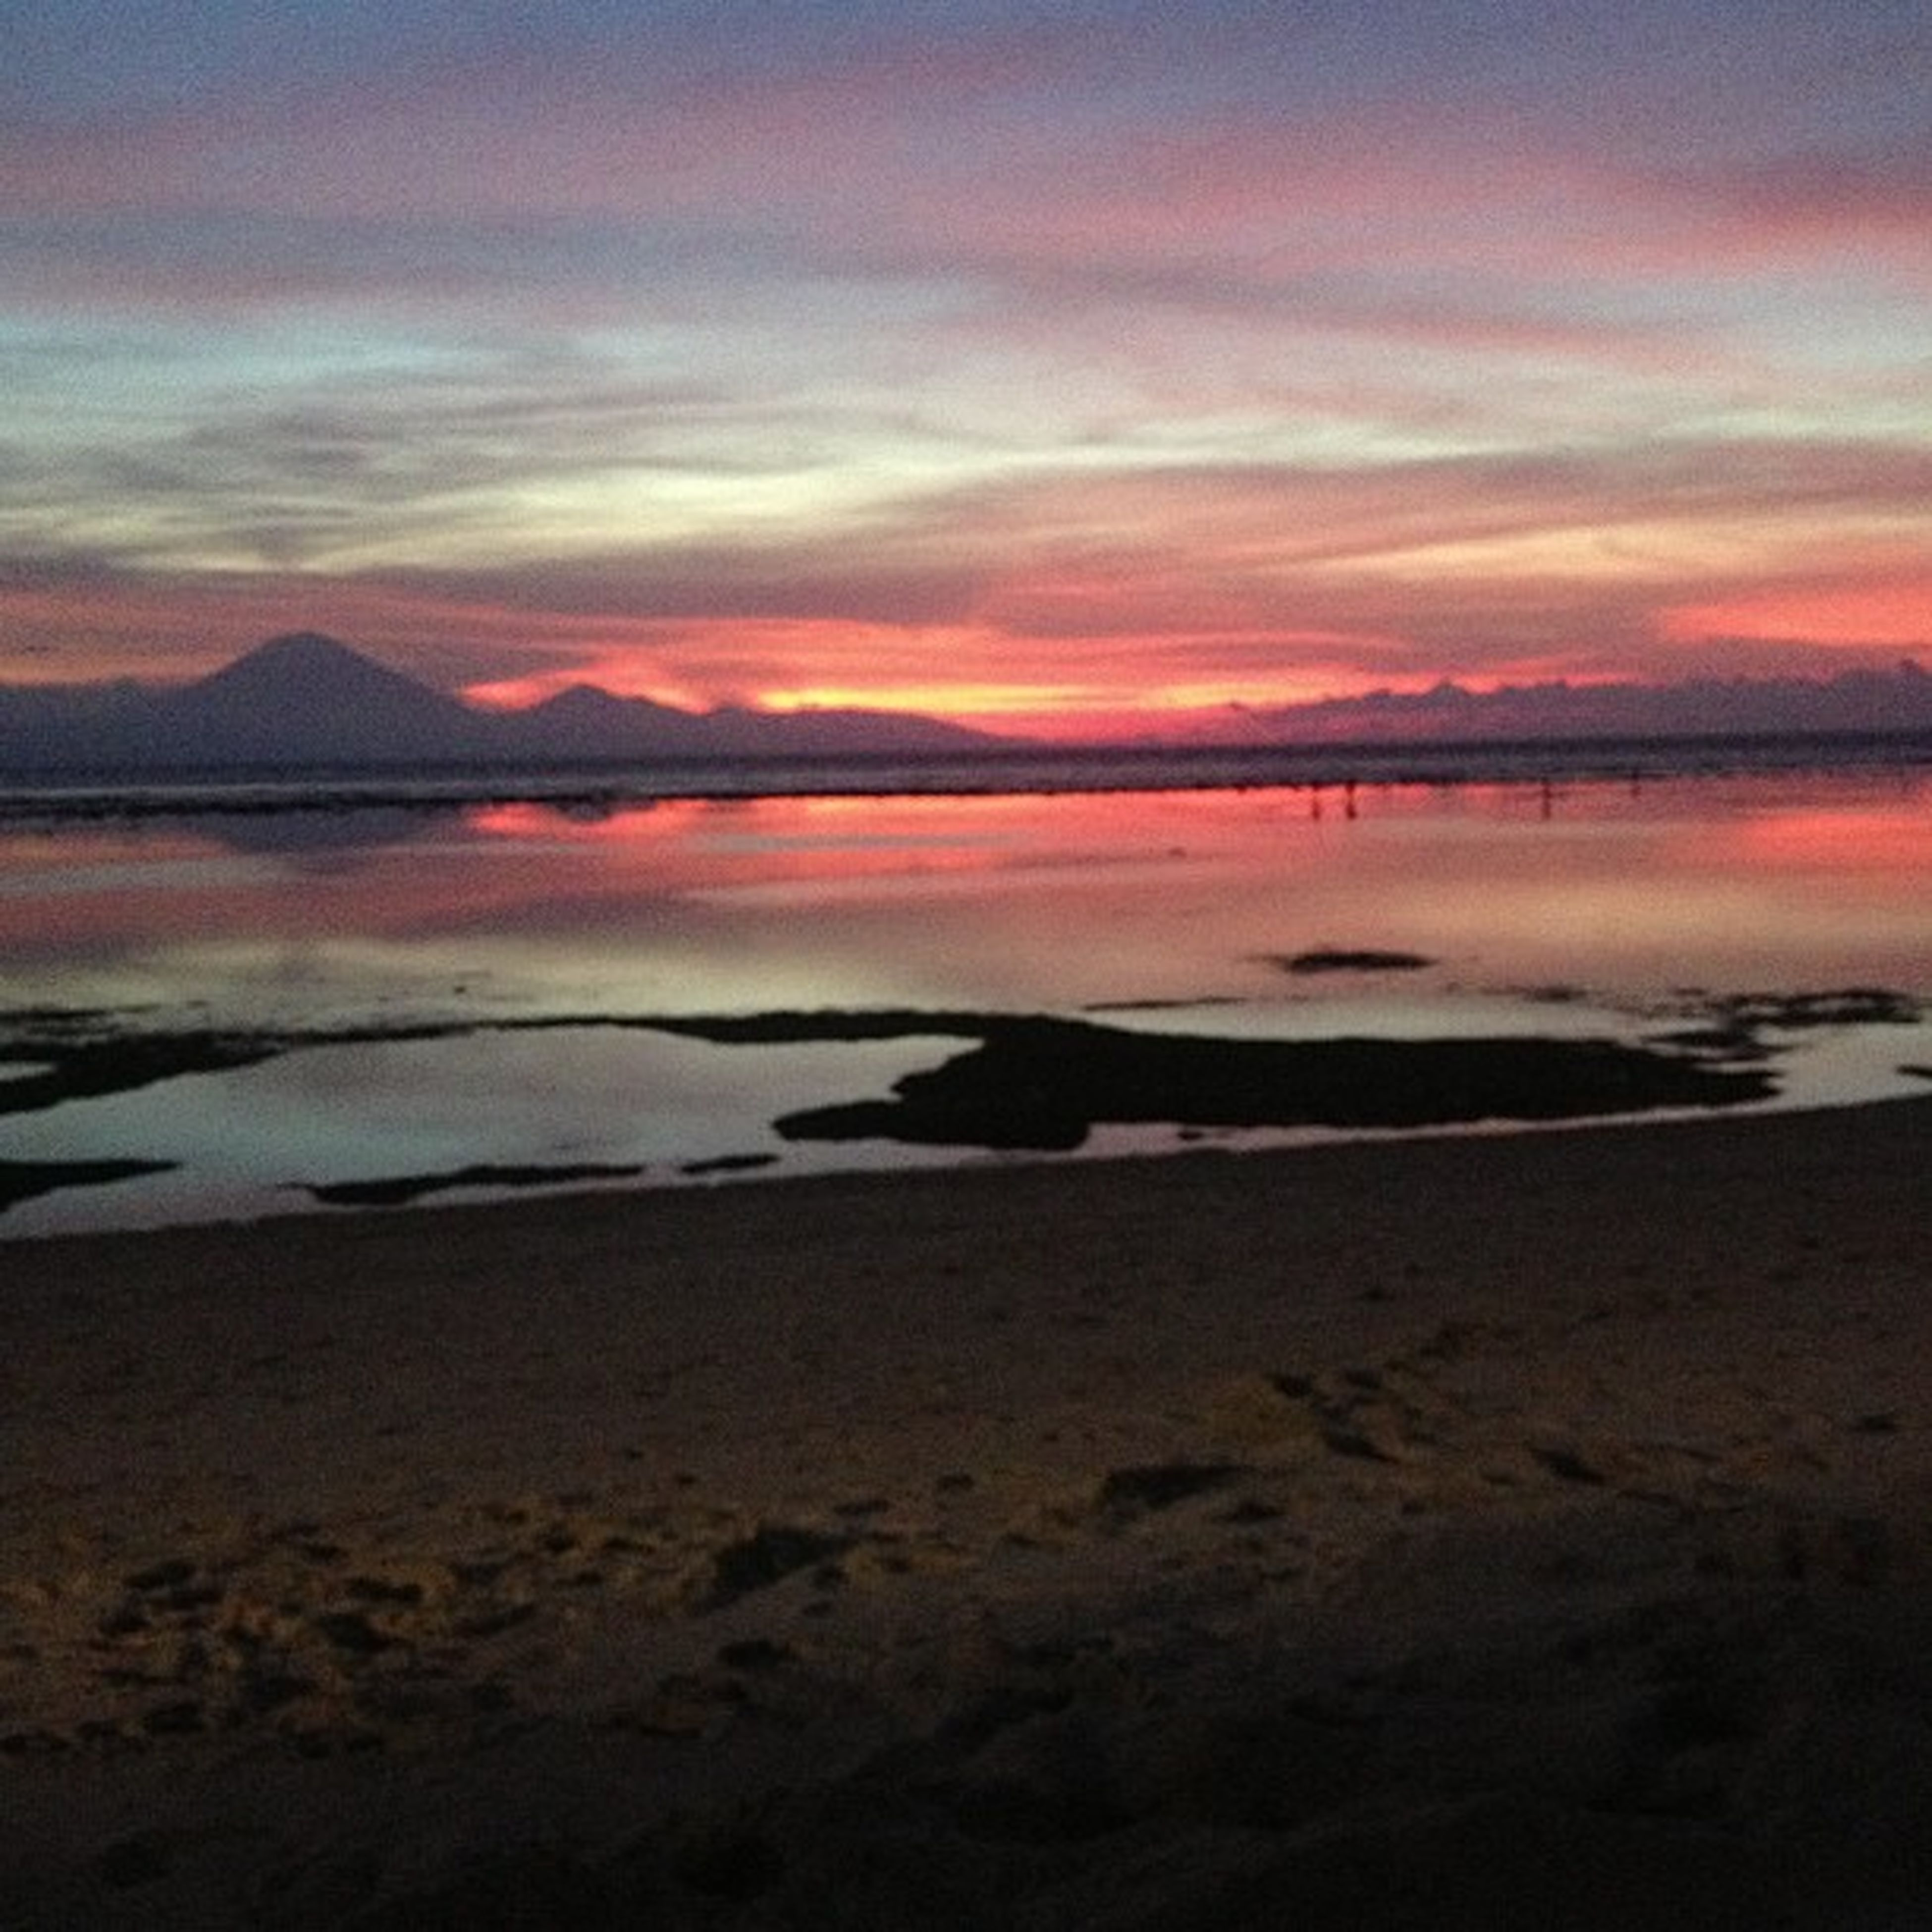 sunset, water, scenics, tranquil scene, sea, sky, beach, beauty in nature, tranquility, orange color, mountain, shore, nature, idyllic, cloud - sky, silhouette, sand, dusk, coastline, outdoors